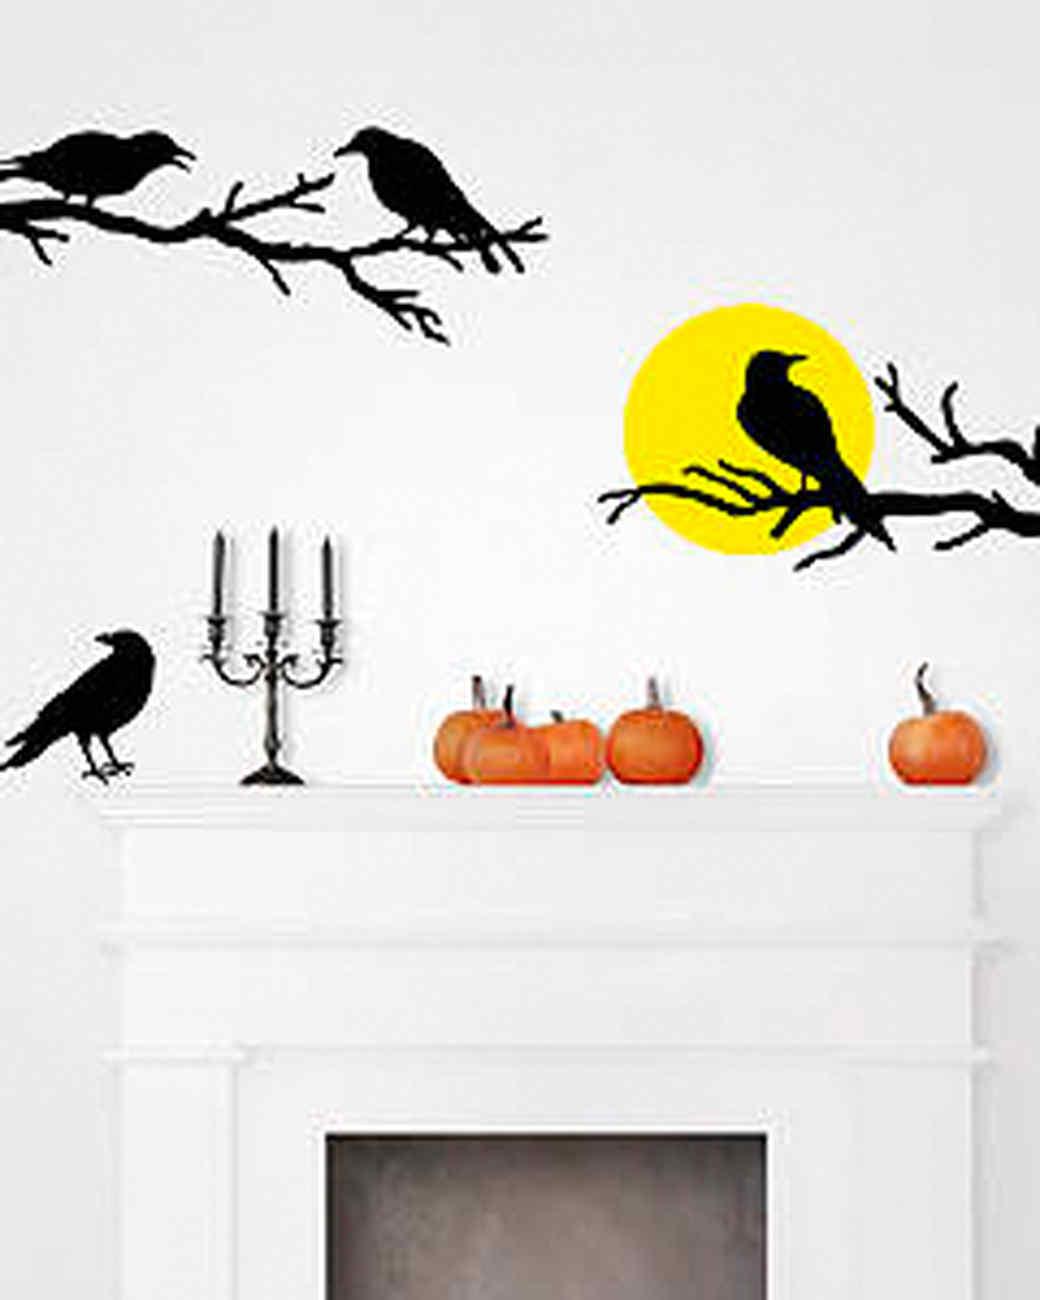 fathead-shopchannel-crows-mrkt-0915.jpg